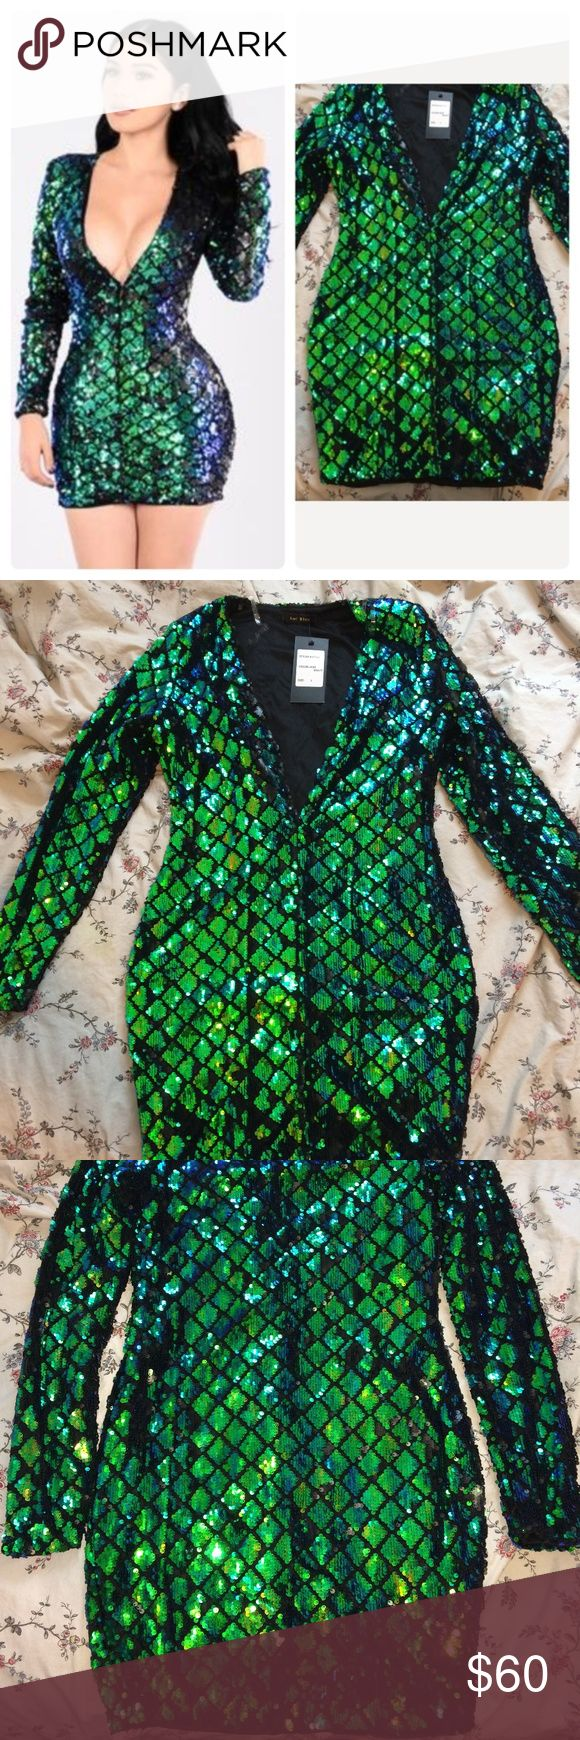 Fashion Nova Baddie New Year Eve / Bday Dress Size L